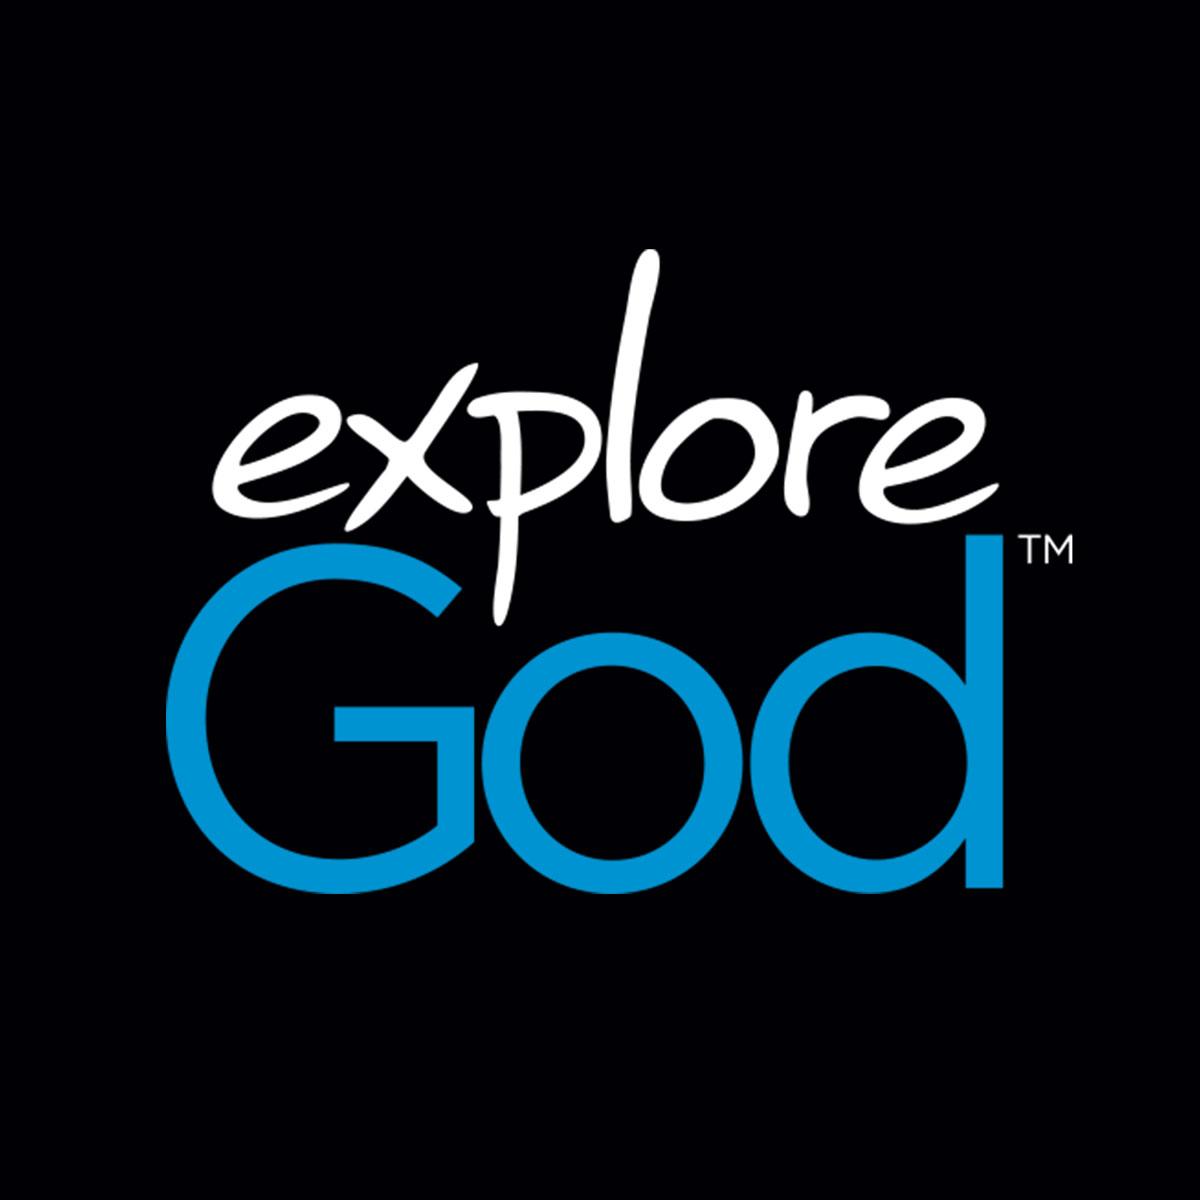 13-explore-god.jpg